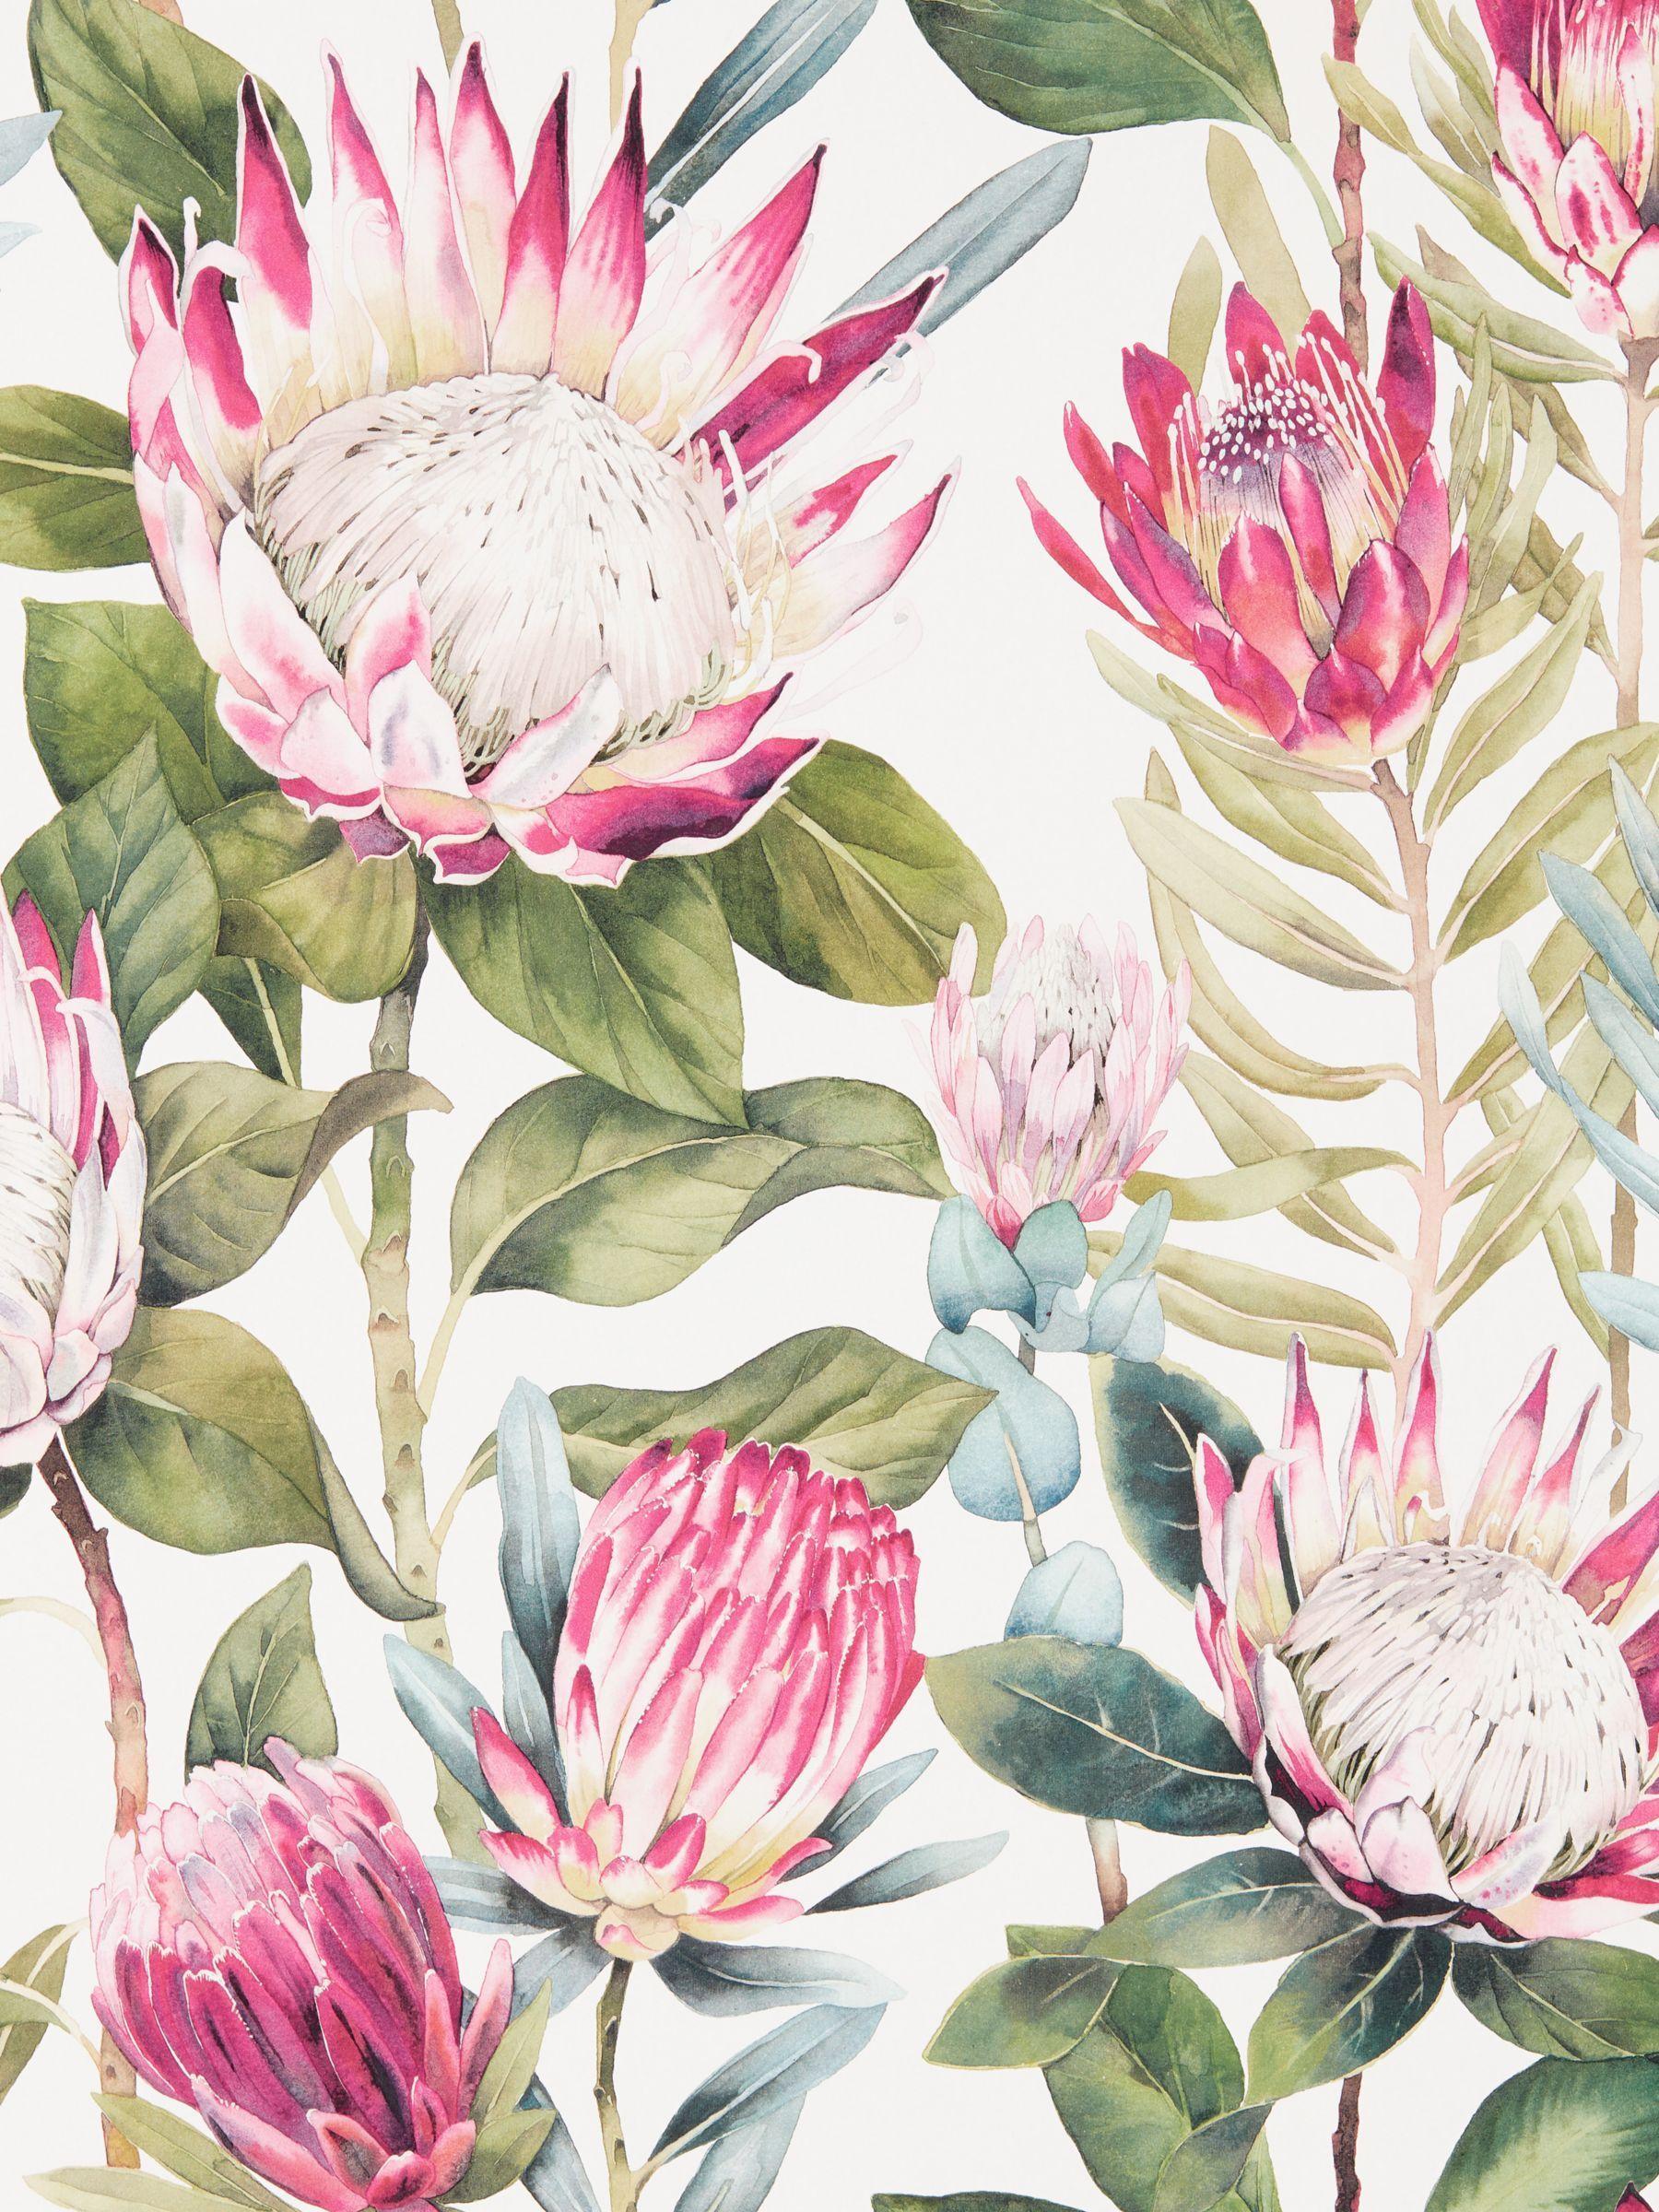 Kendyll Hillegas In 2020 Protea Art Botanical Wallpaper Flower Wallpaper